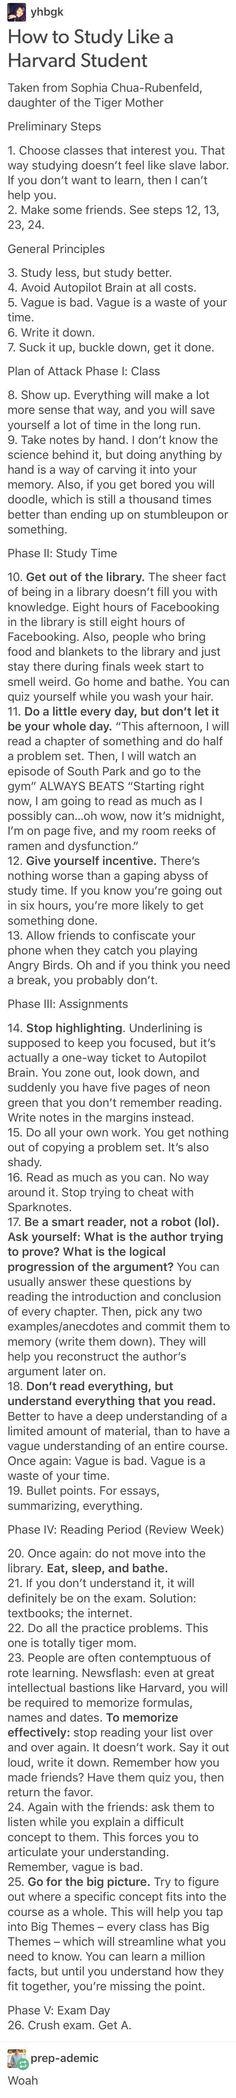 How to study like a harvard student